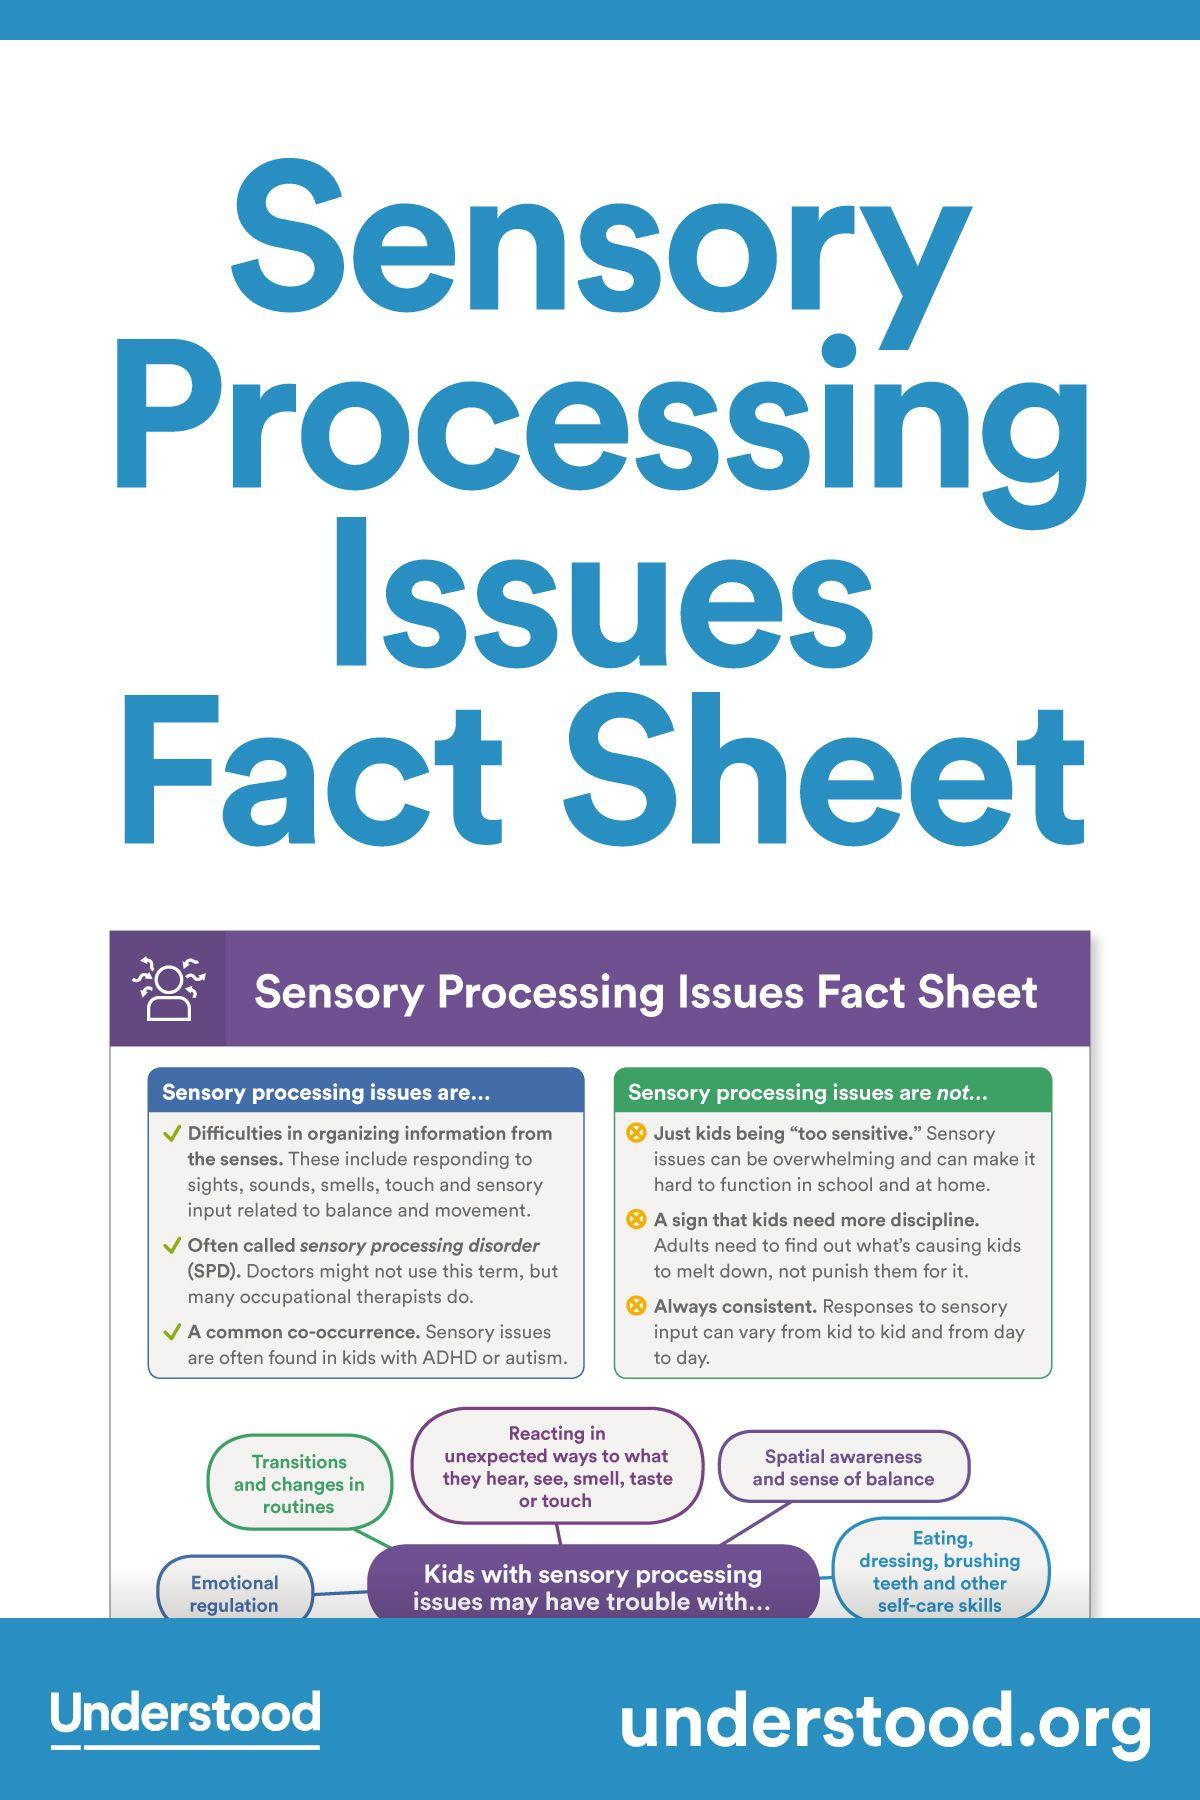 Sensory Processing Issues Fact Sheet